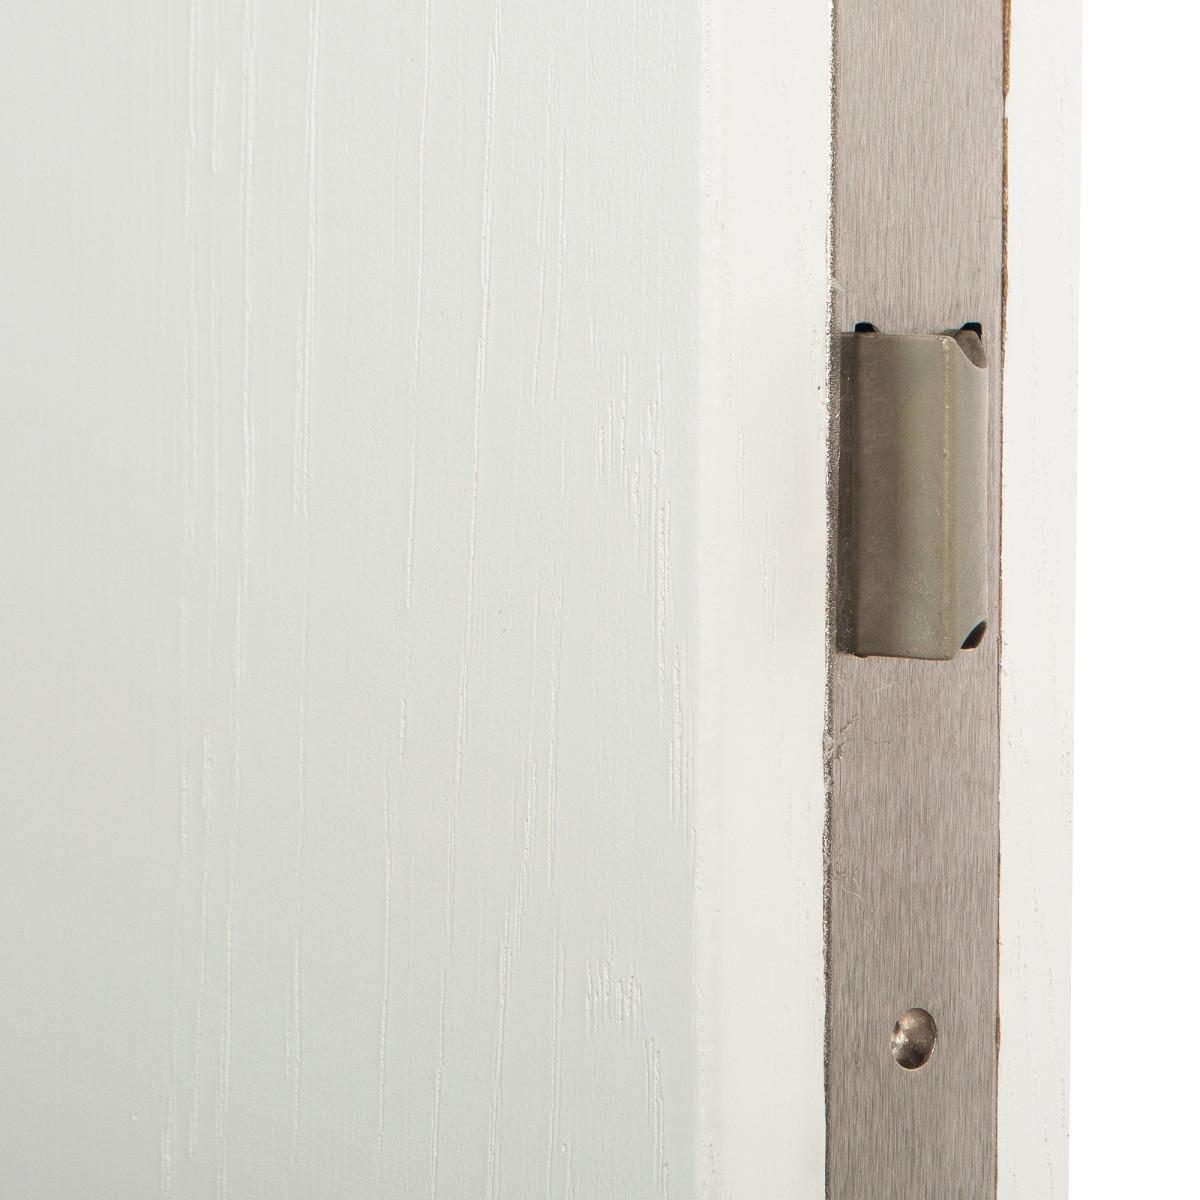 Дверь Межкомнатная Глухая Кристал 60x200 Цвет Пломбир